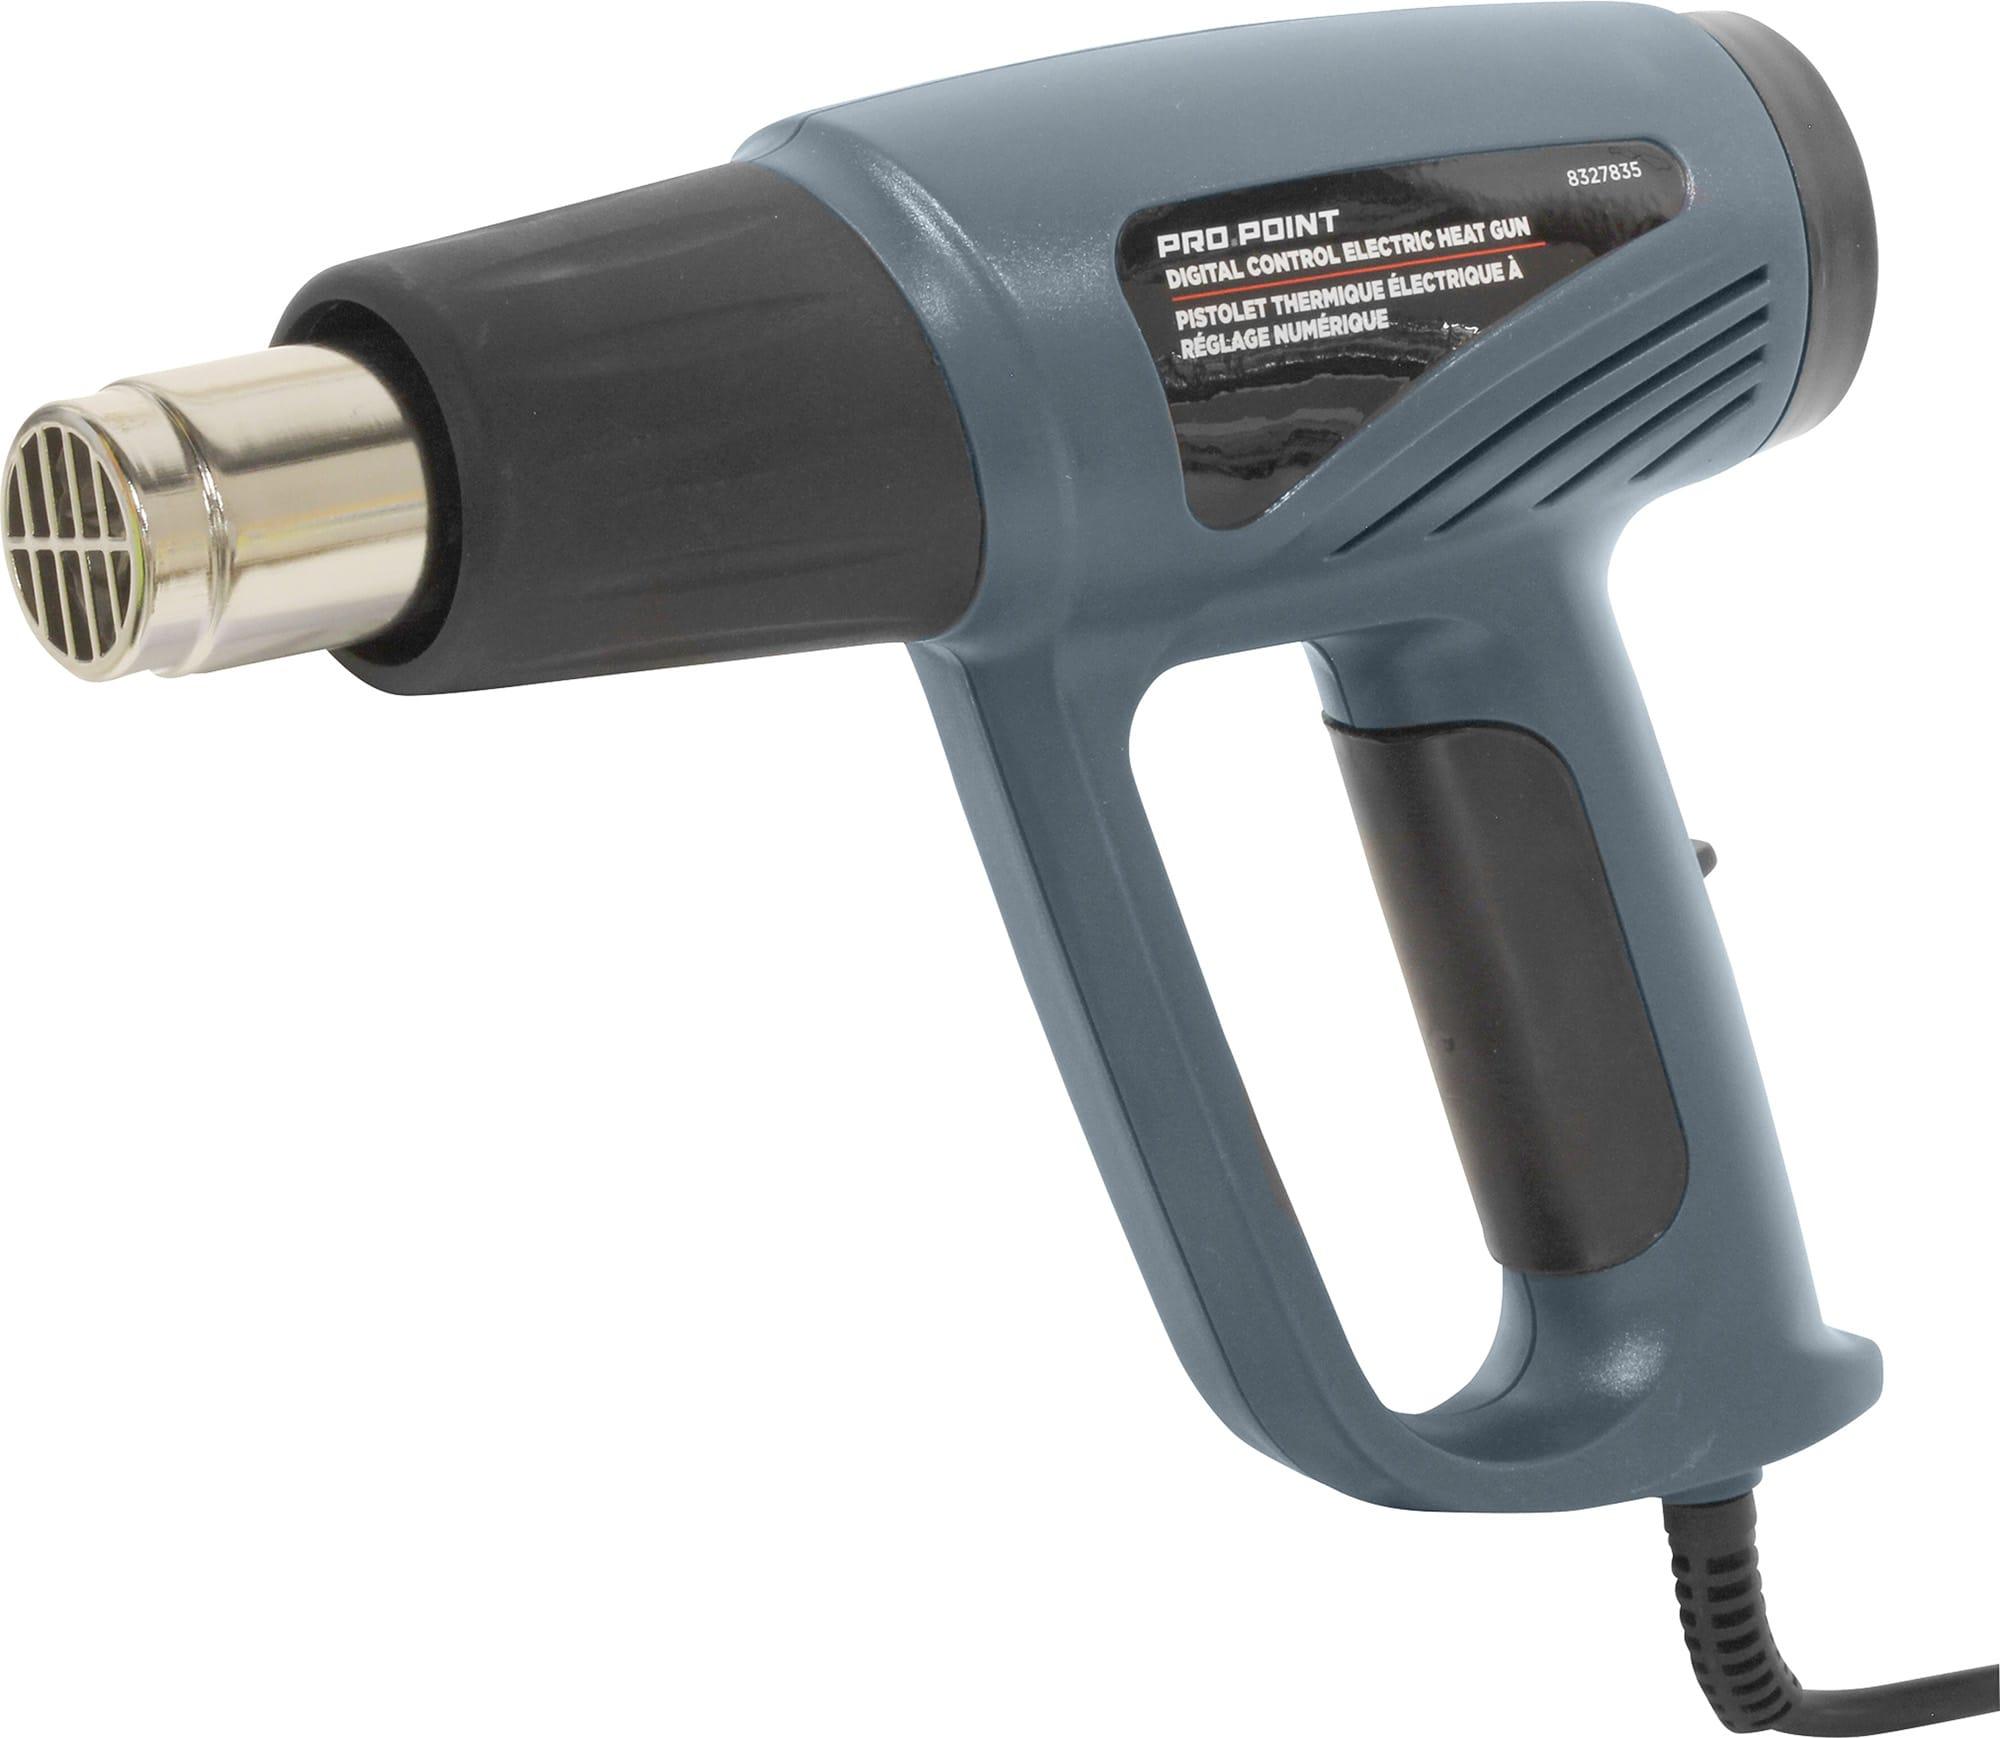 Different Types Of Heat Guns Explained Heat Guns Review